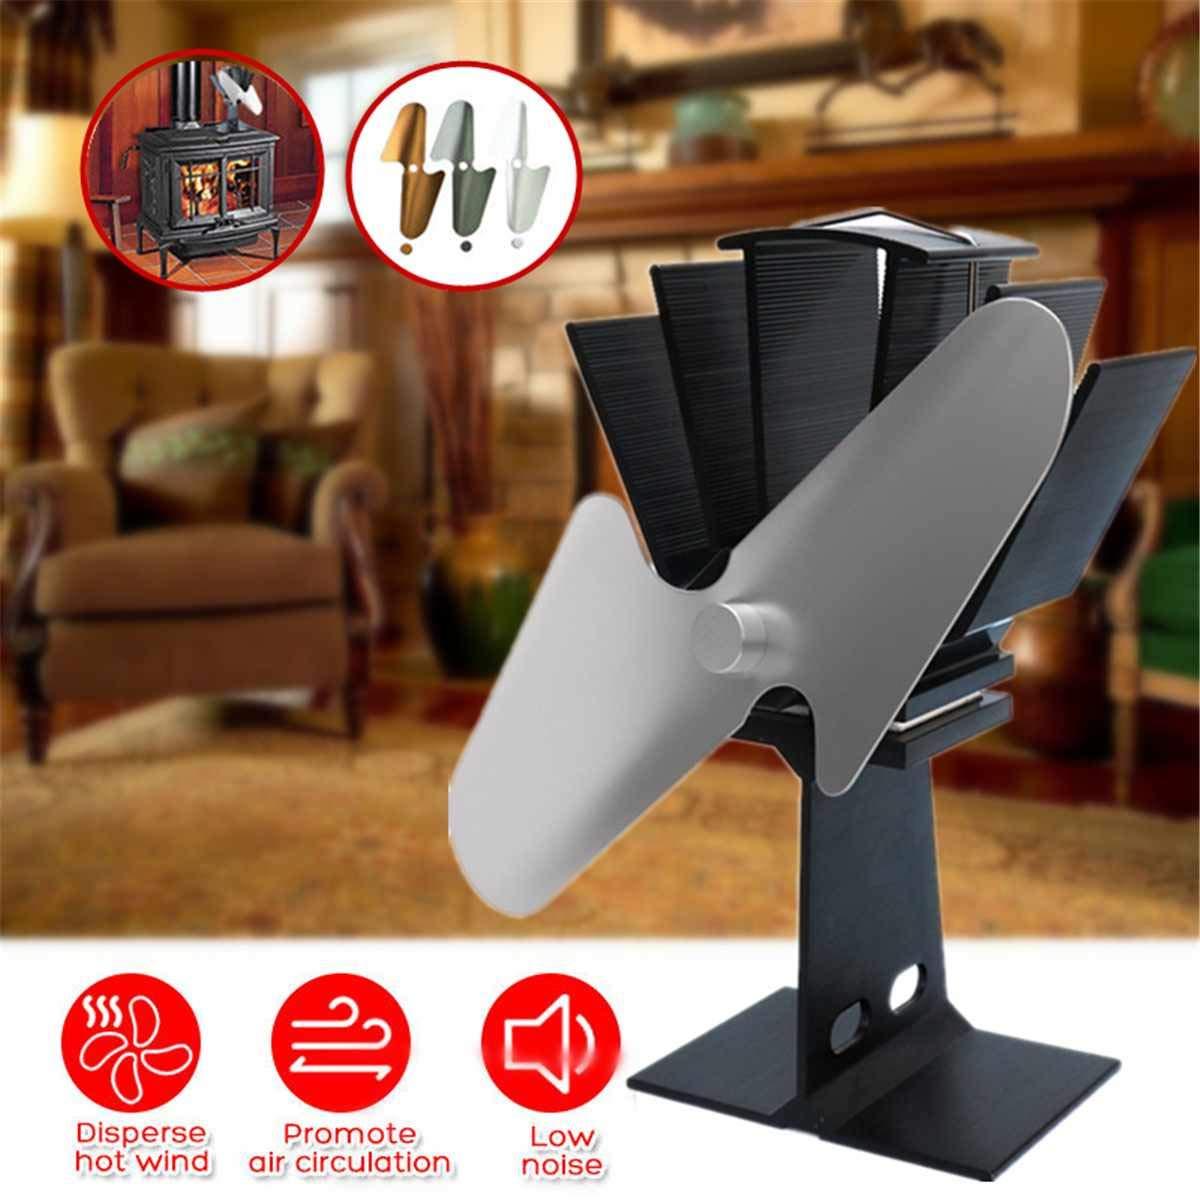 Best Design 4 Blades Stove Fireplace Heat Home Fan Wood Burner Heater Eco Efficient, Wood Heating Stoves - Wood Stove Heat Powered Fan, Wood Stove Heat Saver, Woodstove Fan, Wood Stove Heat Recovery by Convenient ShopS